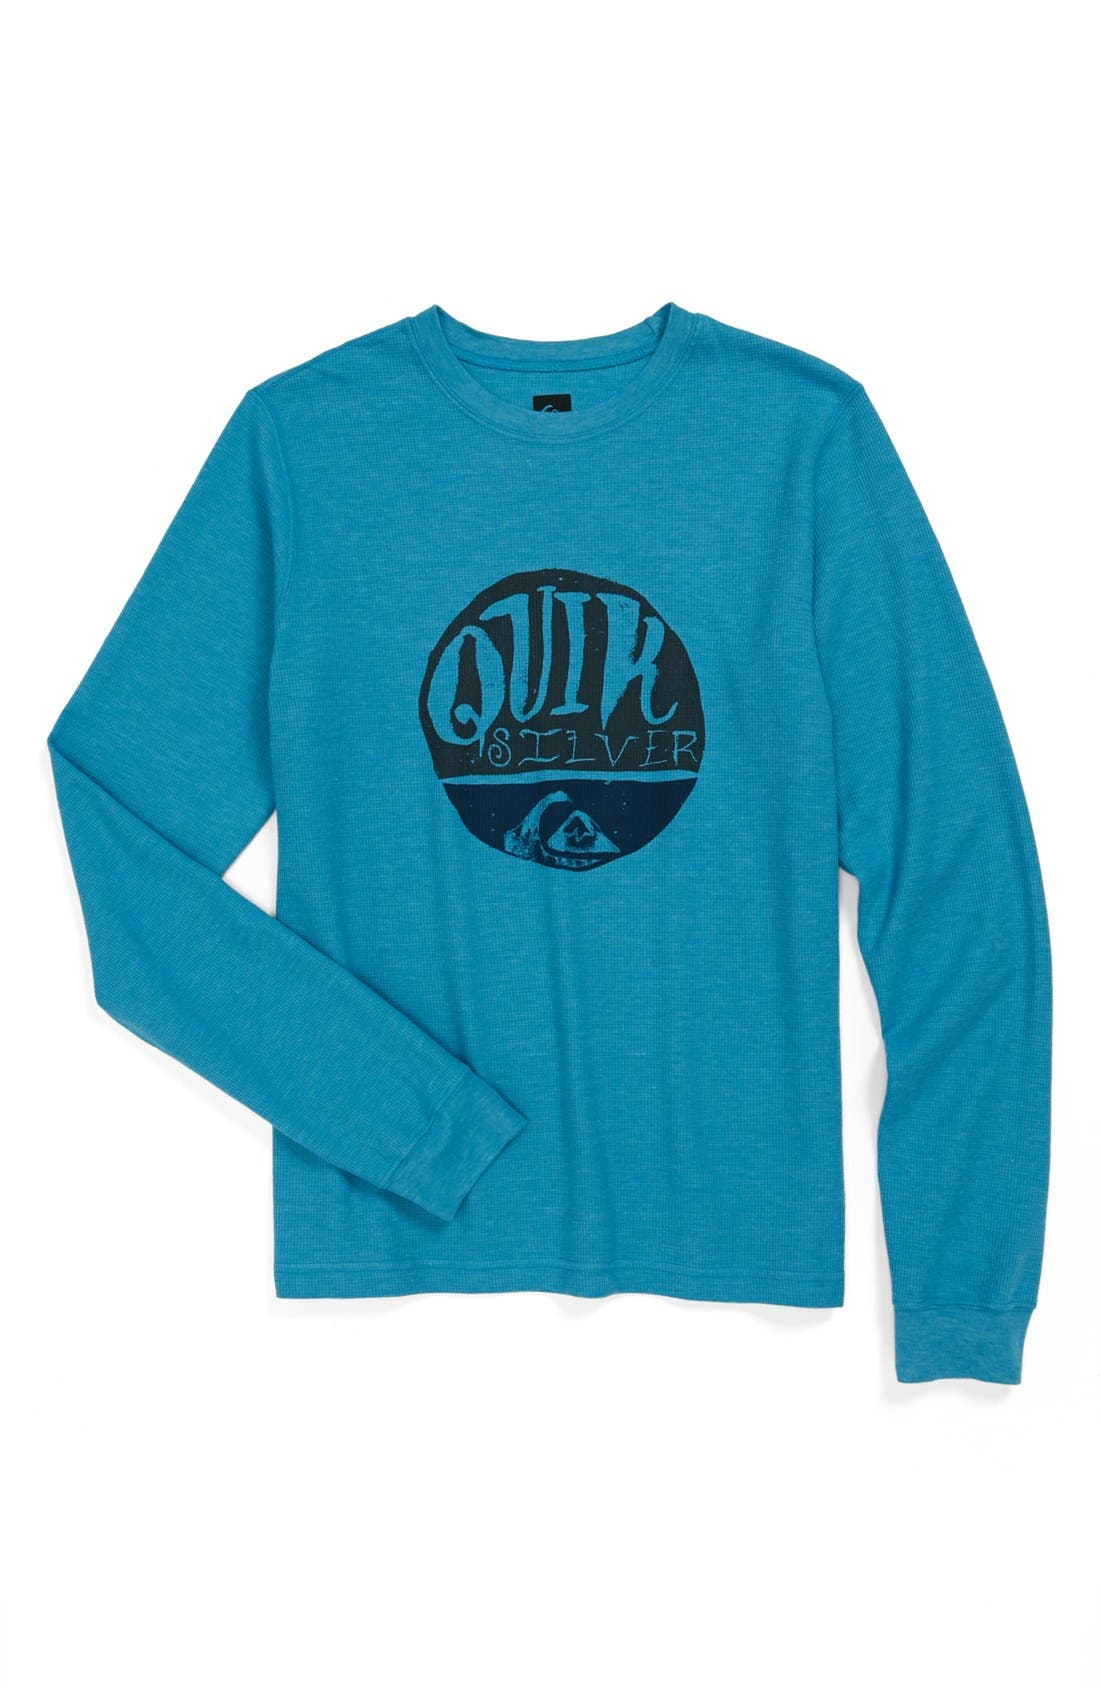 Main Image - Quiksilver 'Sunrise' Long Sleeve Thermal Shirt (Big Boys)